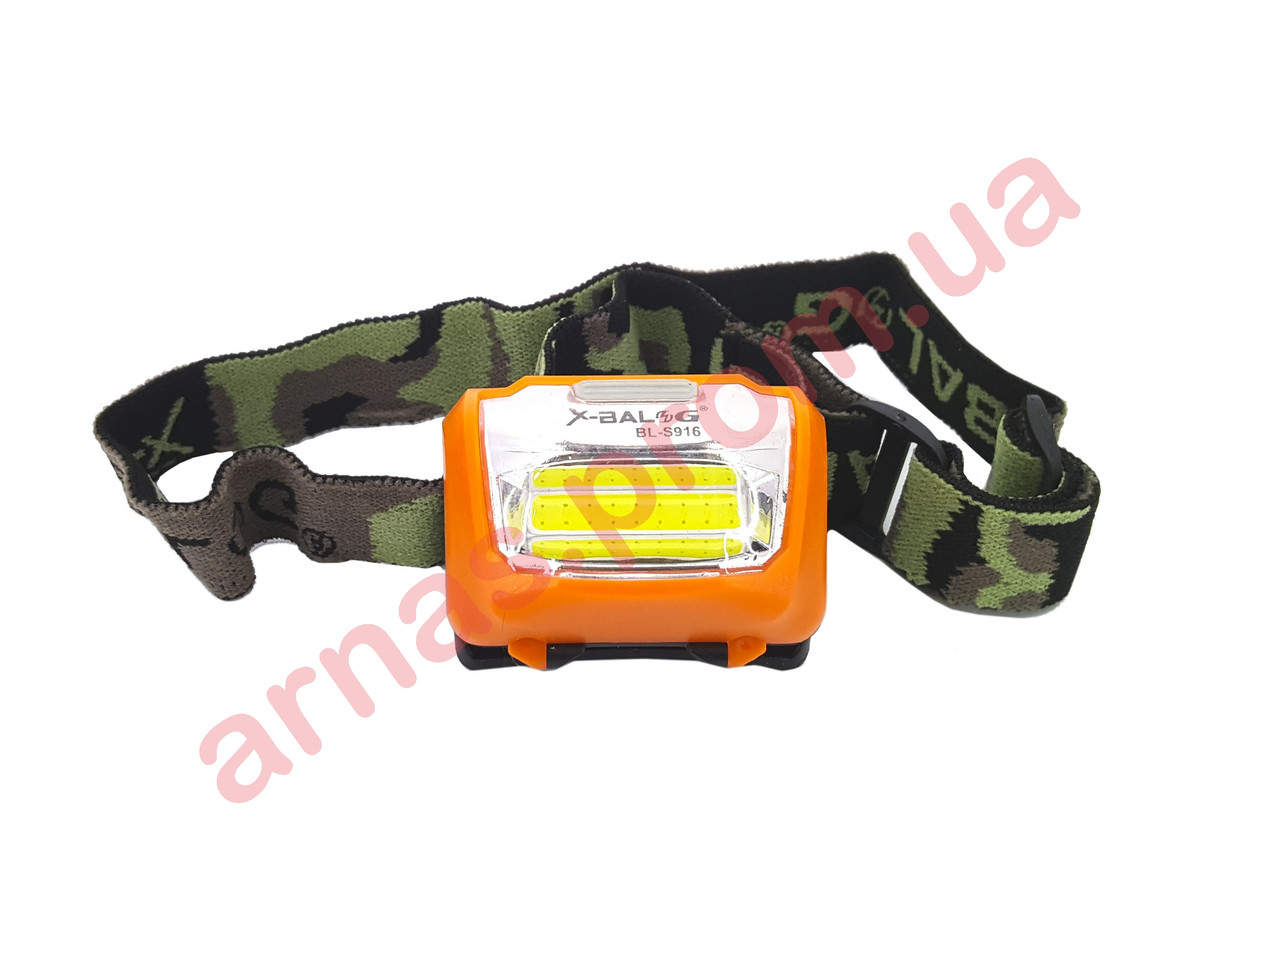 Налобный фонарь Bailong BL-S916 (NF-T835)